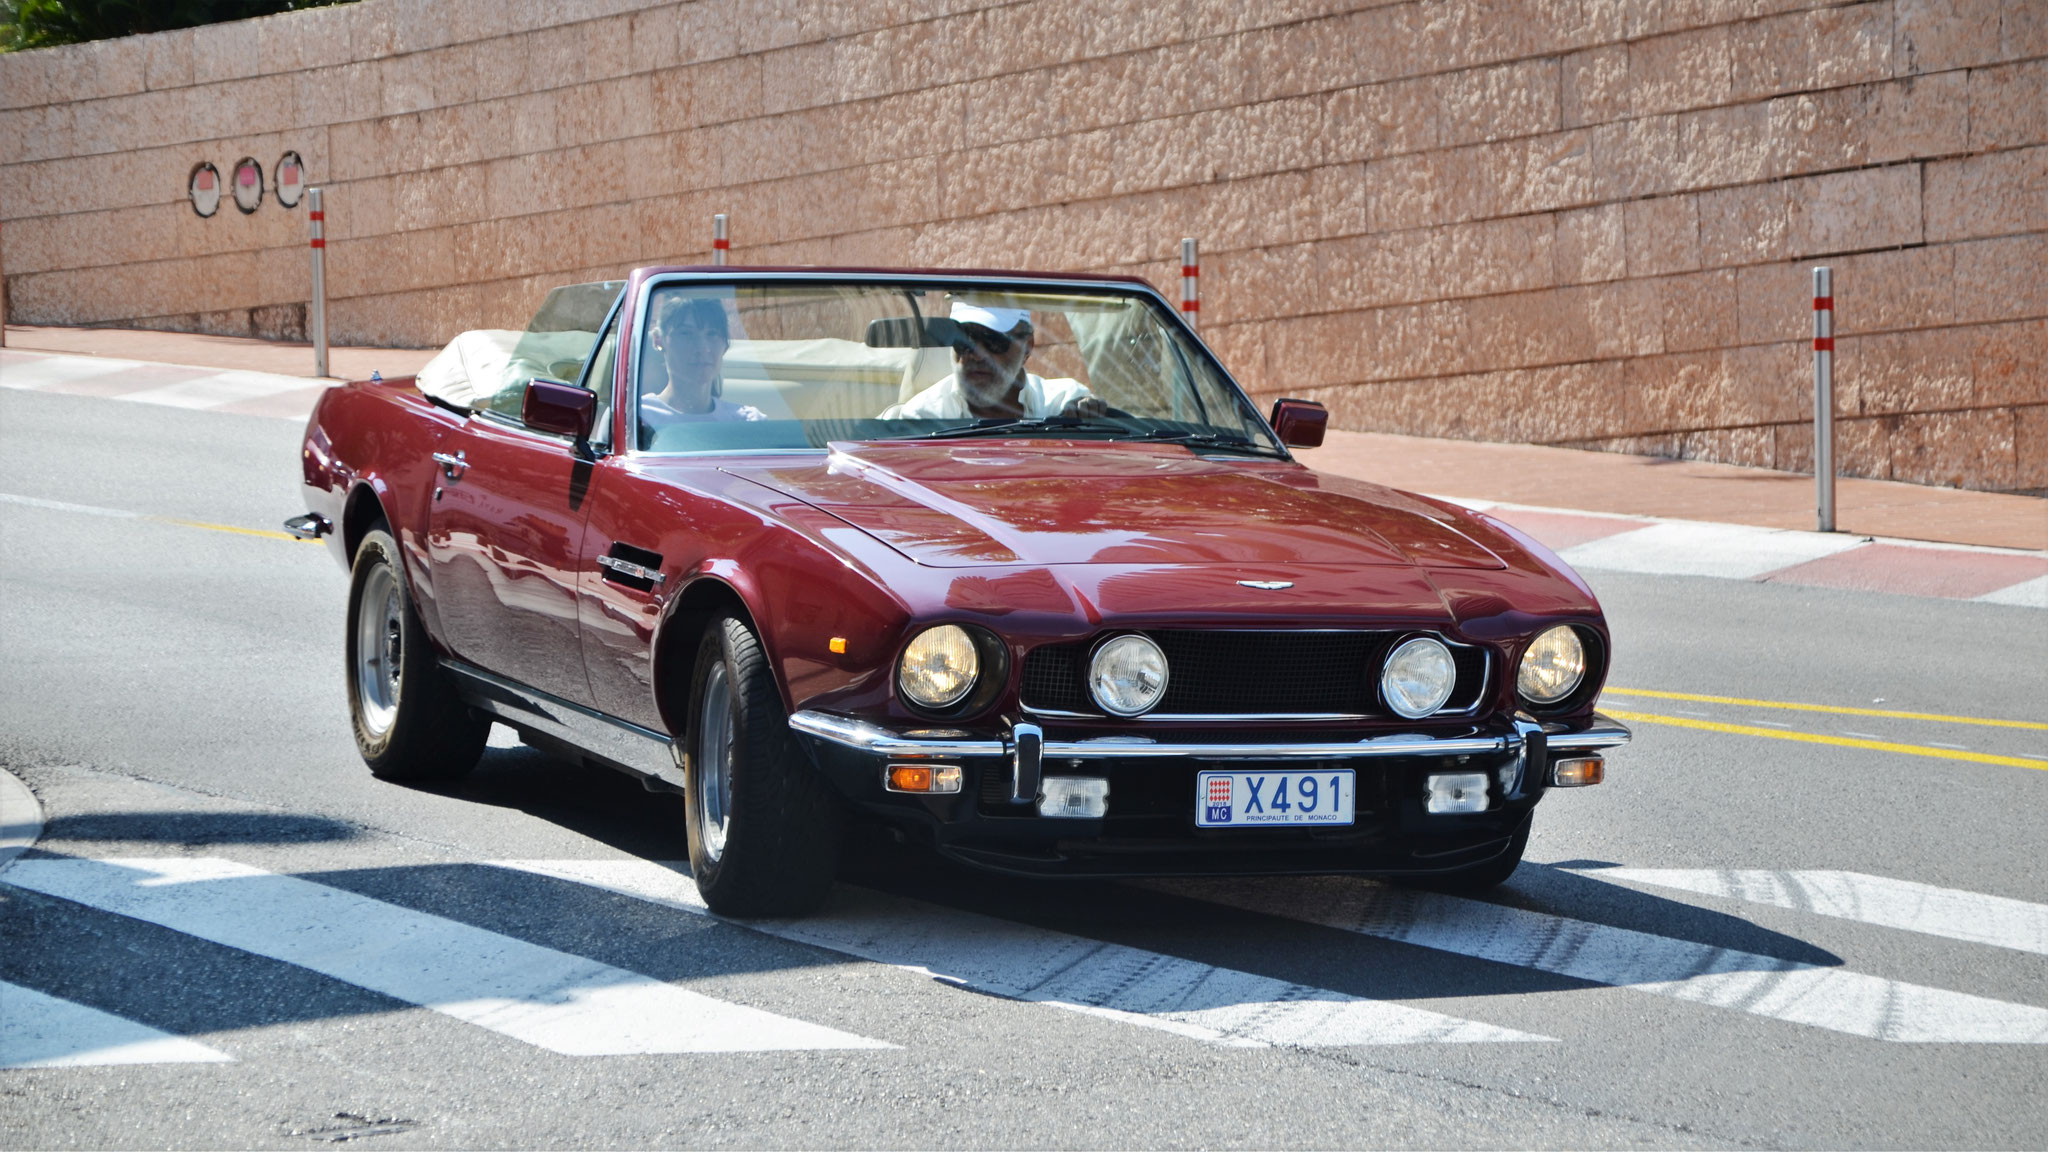 Aston Martin V8 Vantage Volante 1983 - X491 (MC)